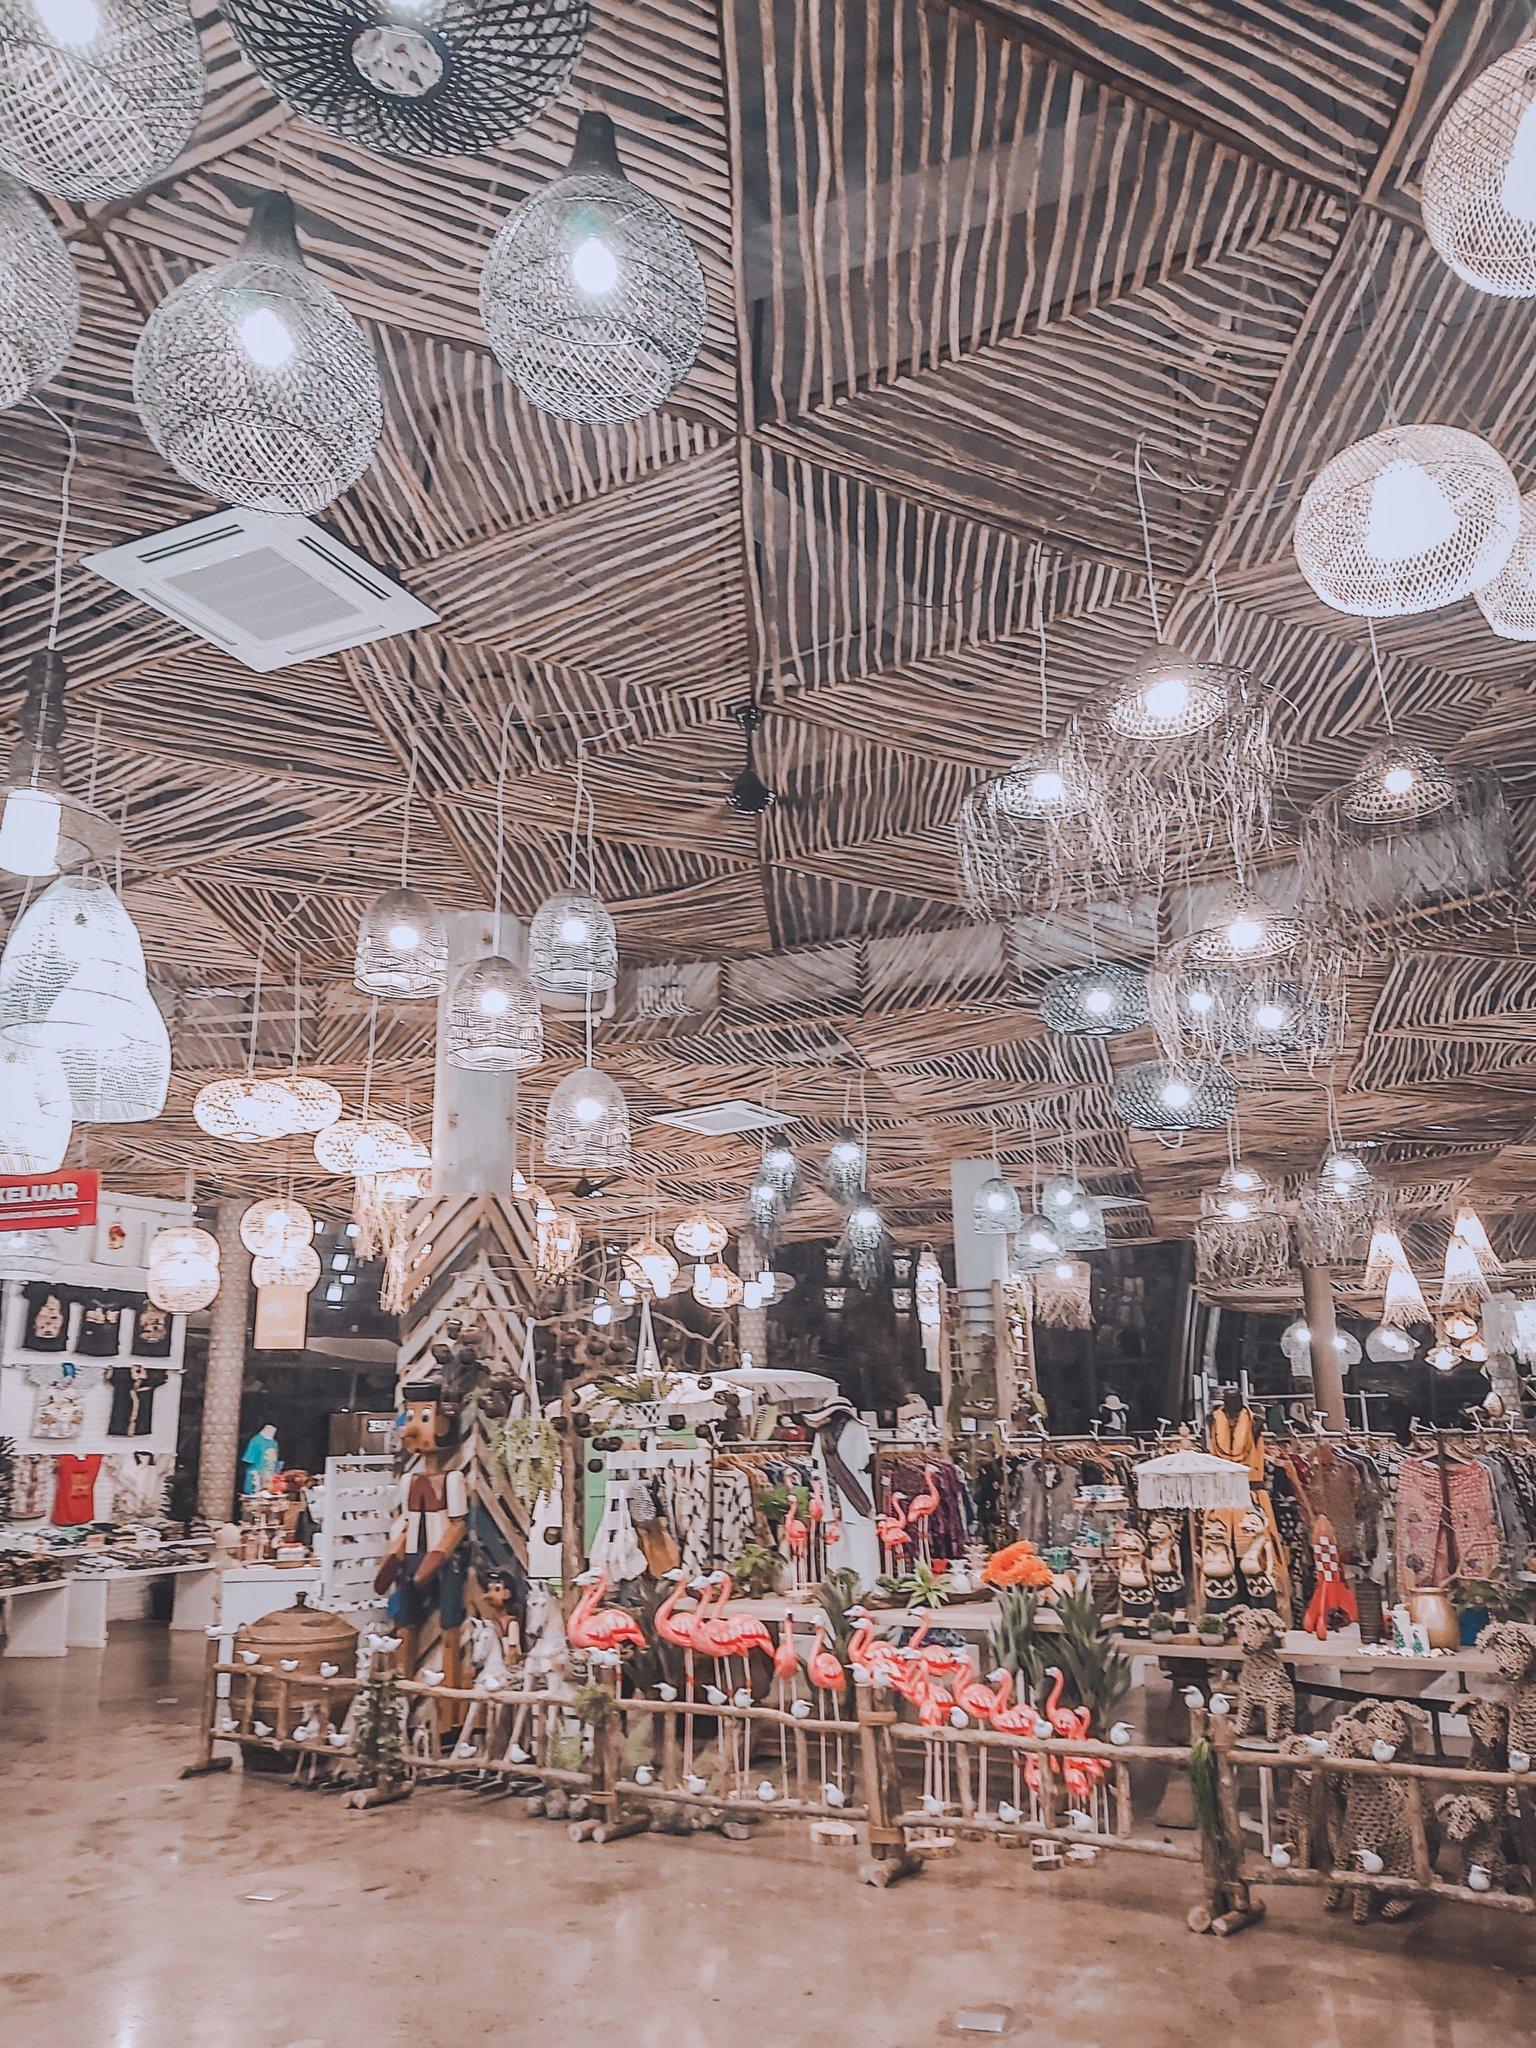 EBONaKnUIAATuWS?format=jpg&name=large - Rute dan Harga Tiket Masuk Dusun Semilir Eco Park yang Hits dan Instagramable